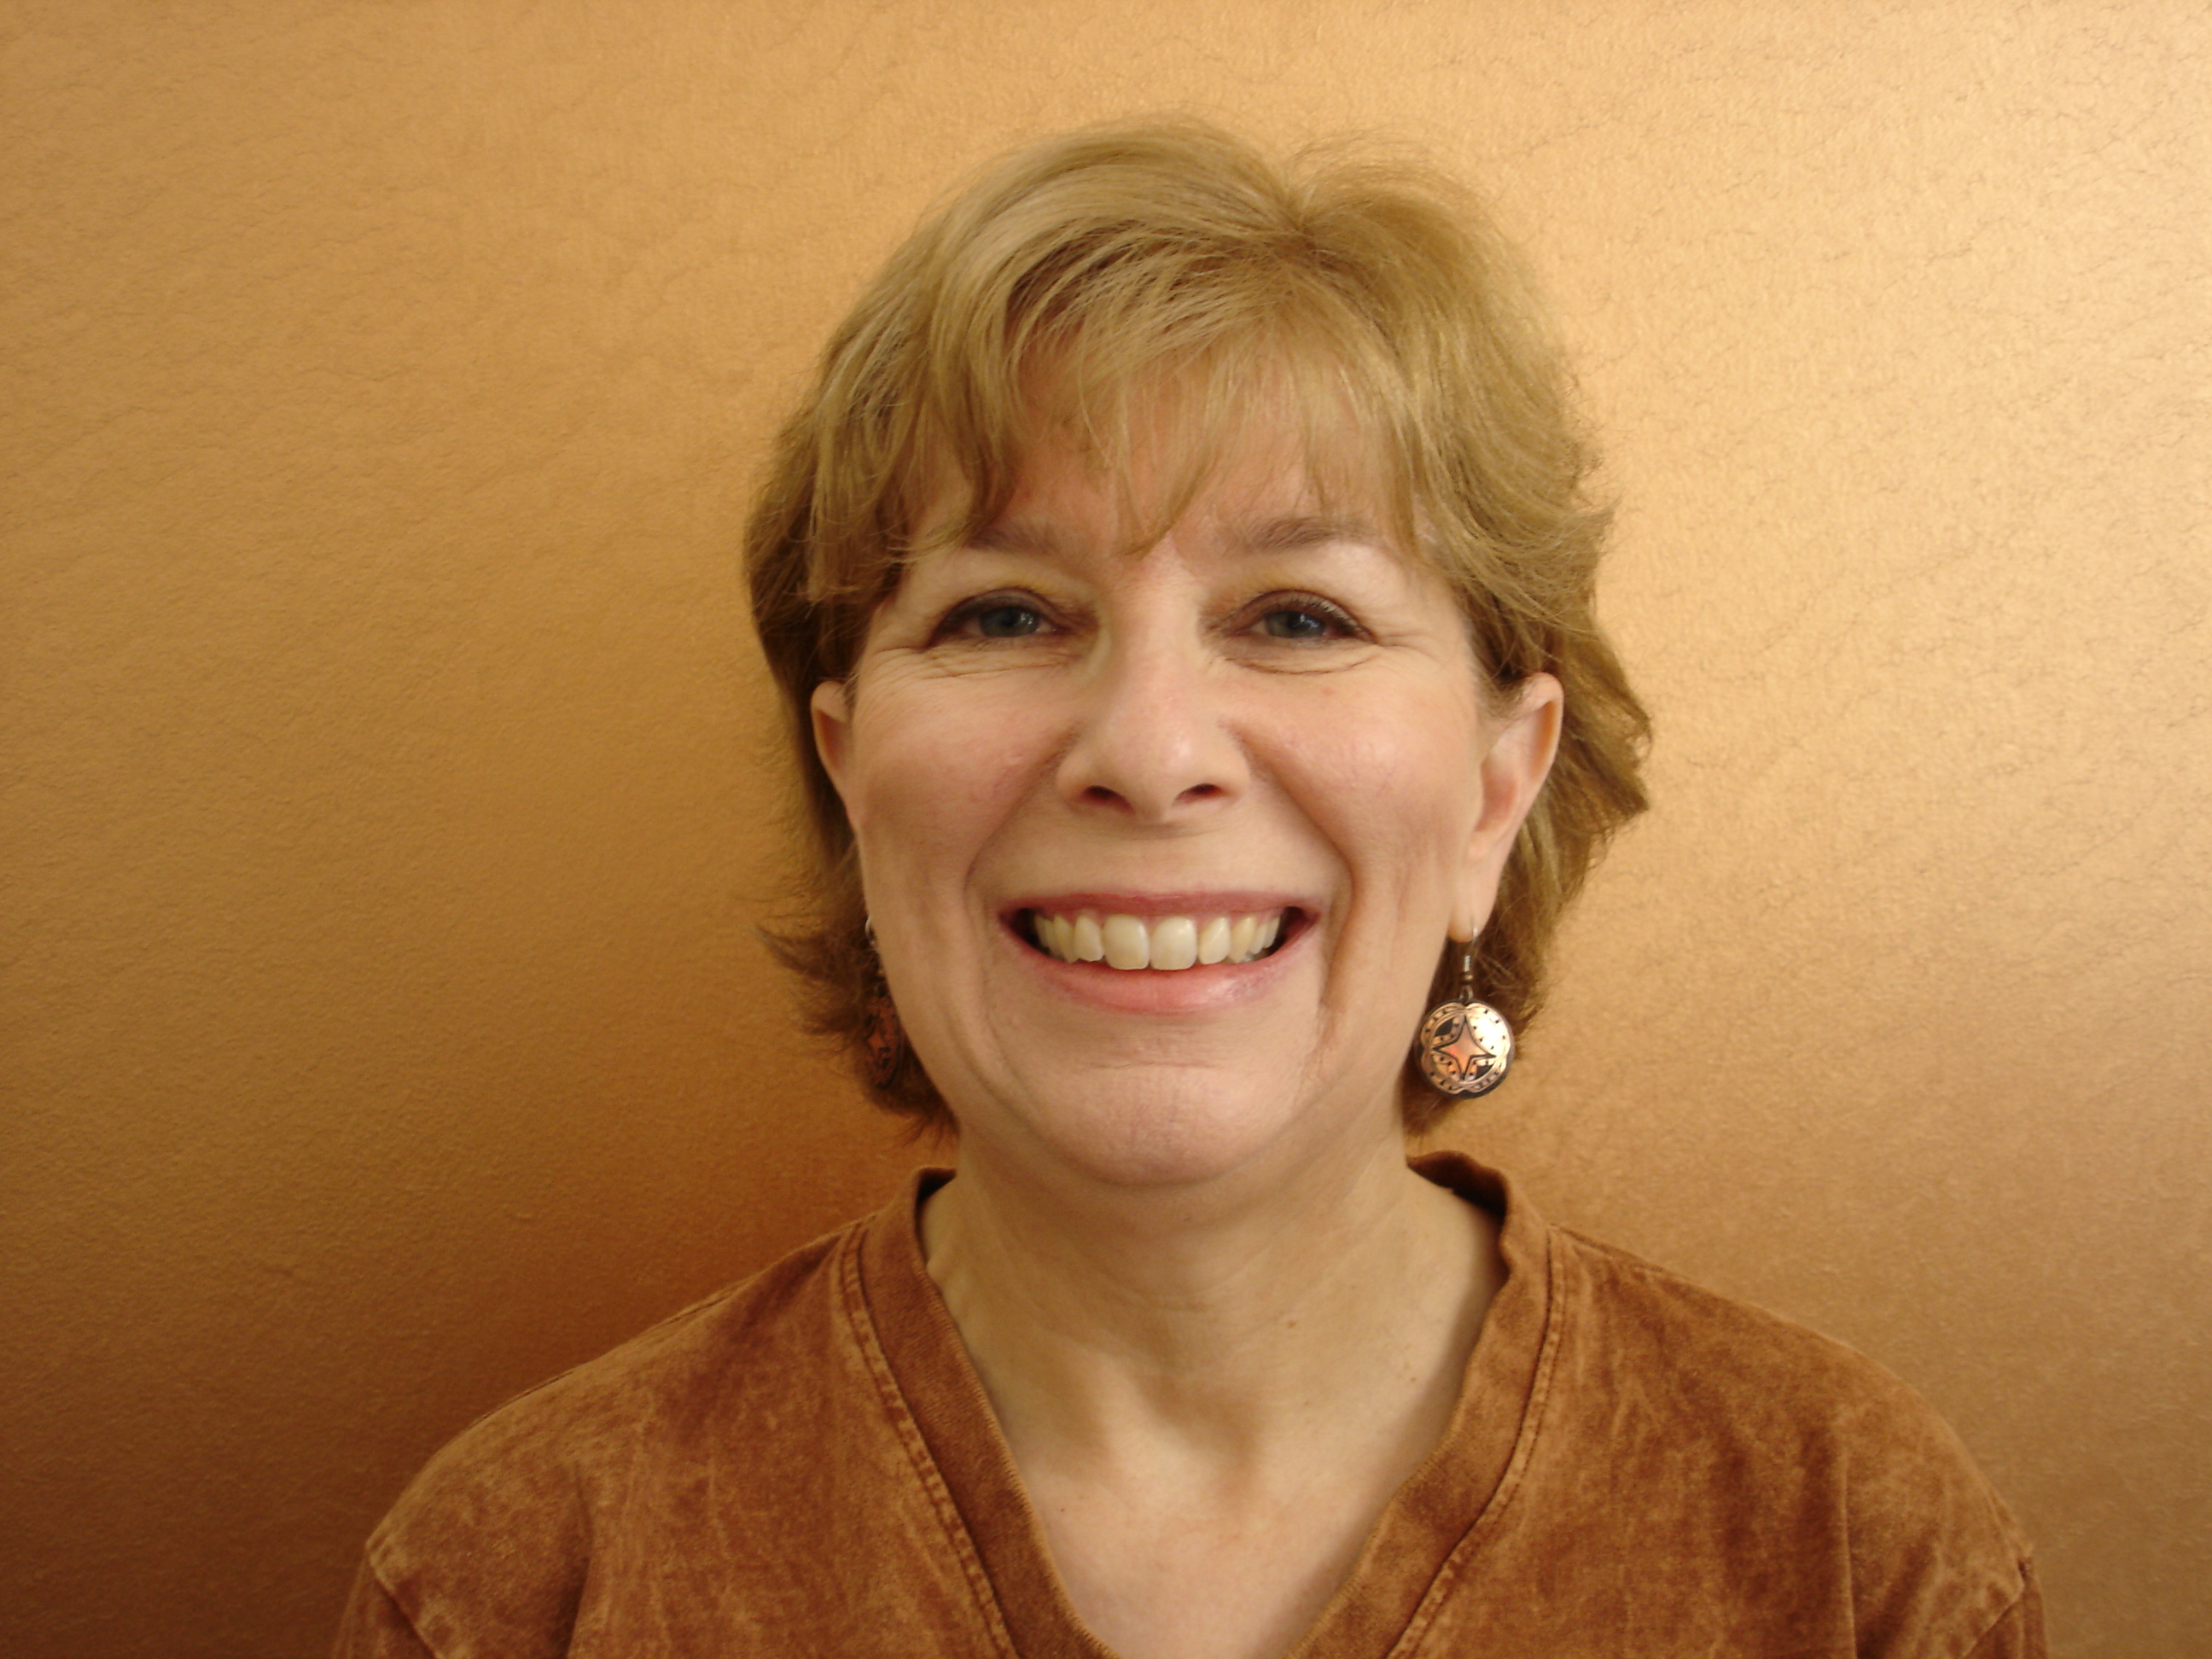 Susan Berman Net Worth